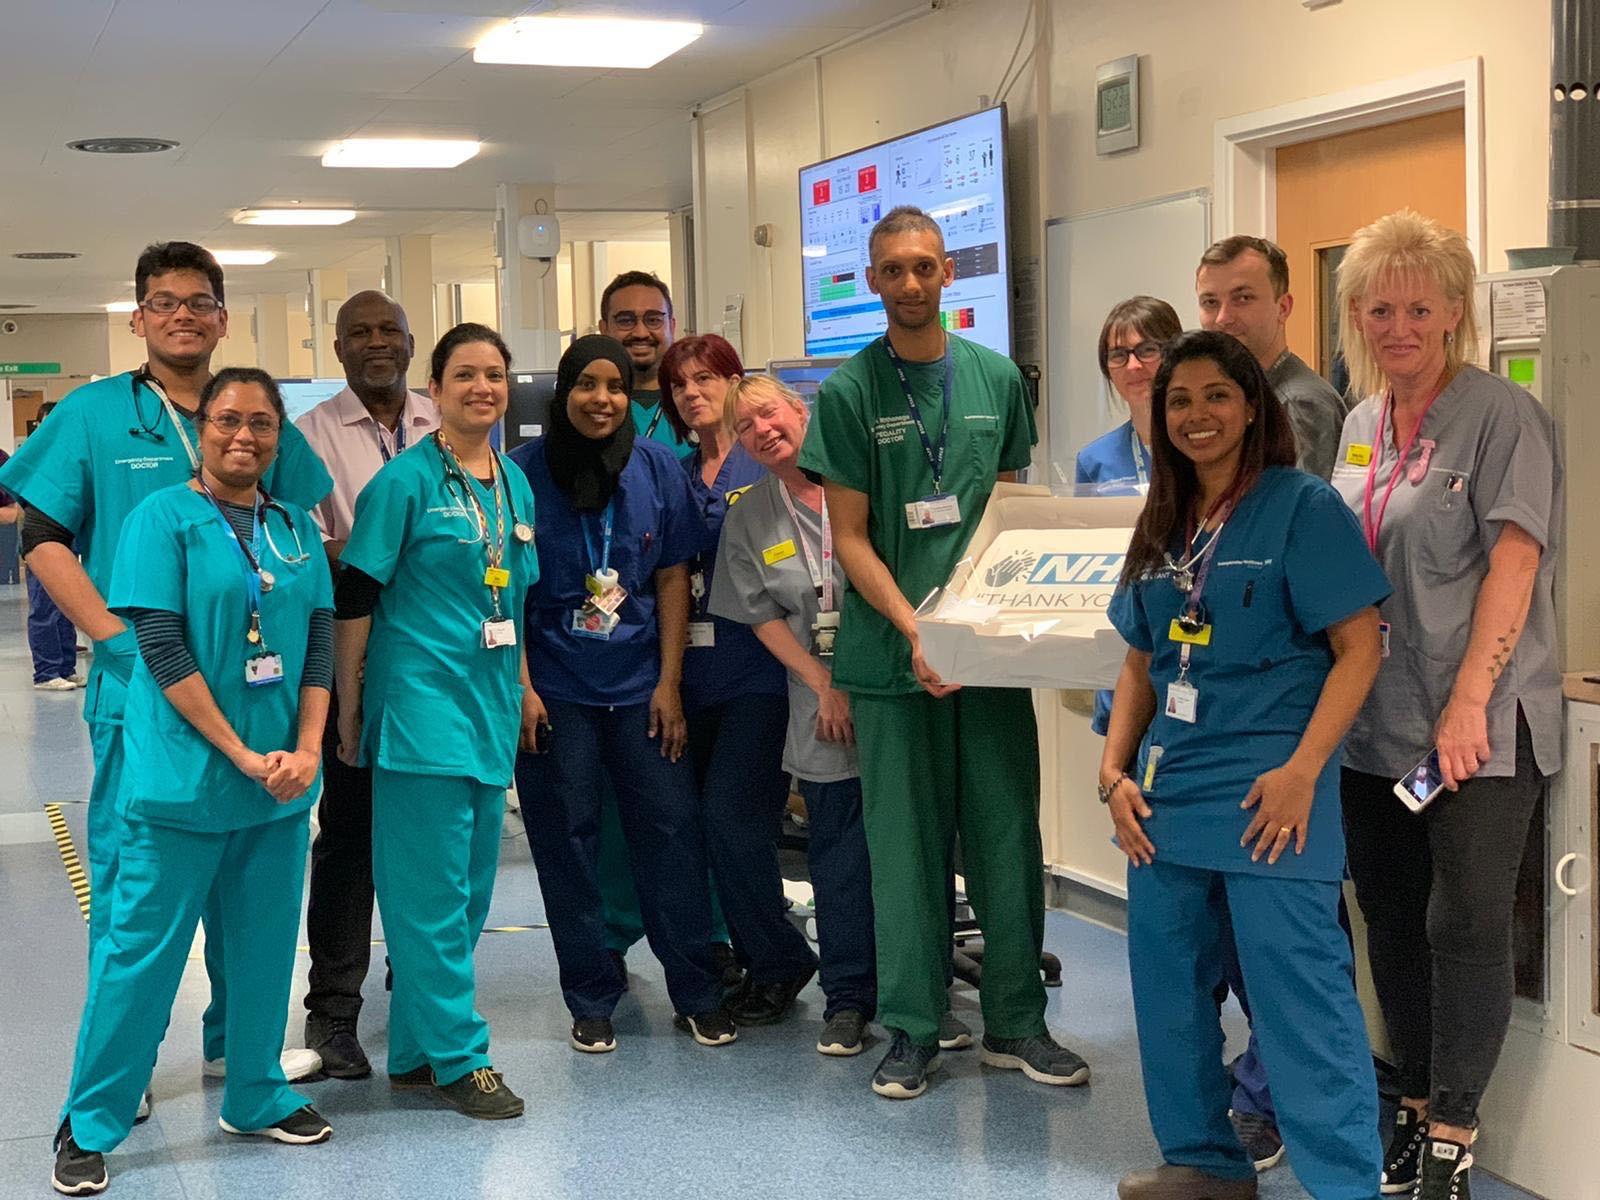 Cakes for NHS Staff at Stoke Mandeville Hospital